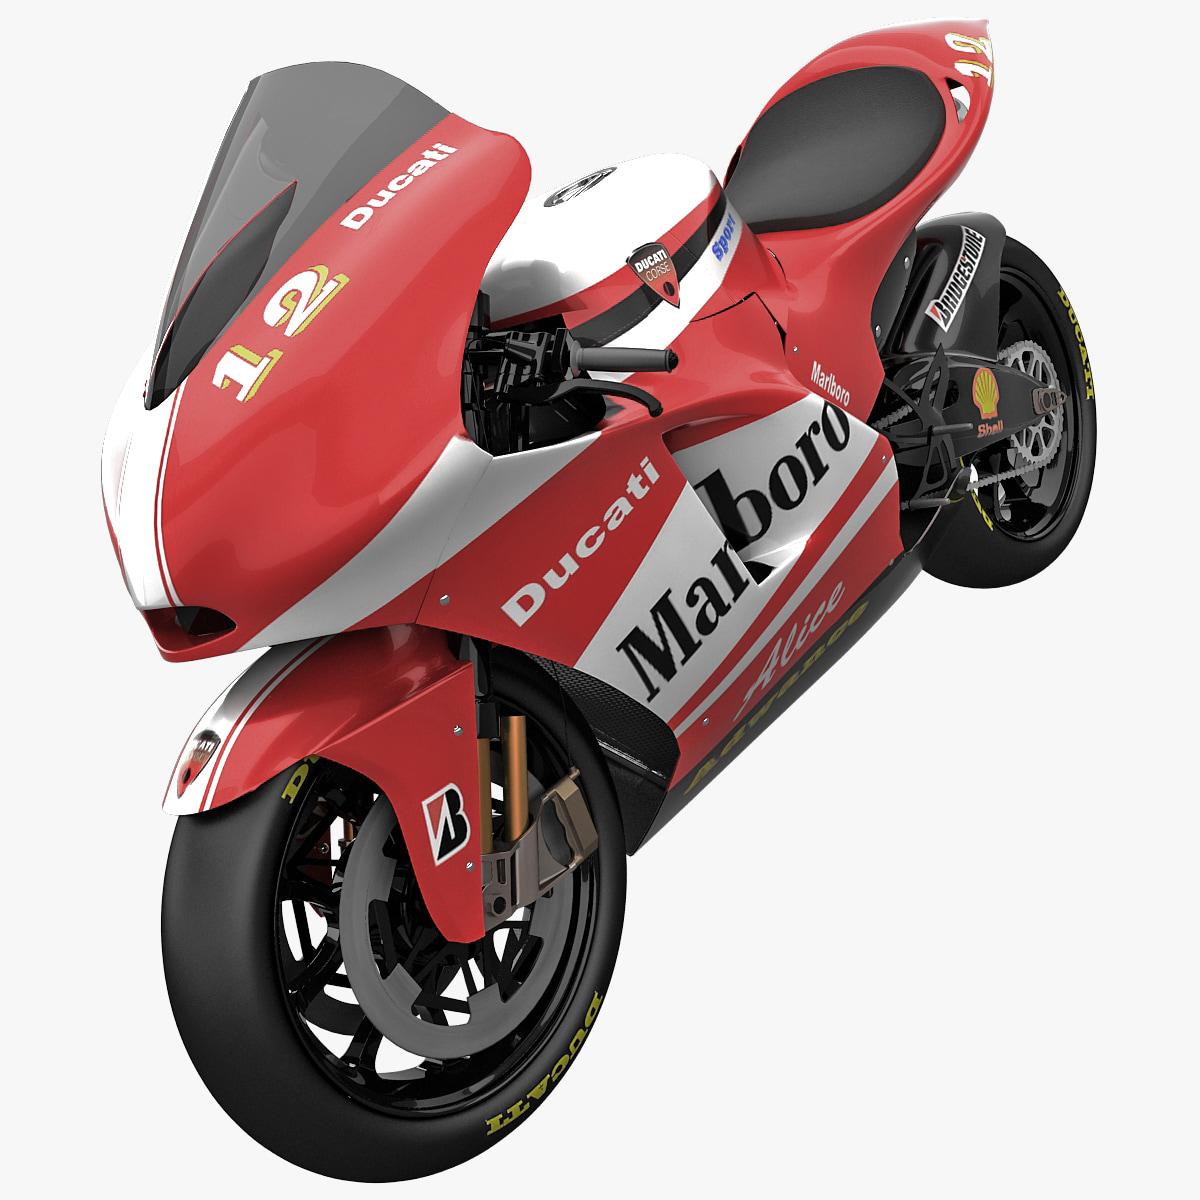 Dantin_Pramac_Ducati_GP4_000.jpg